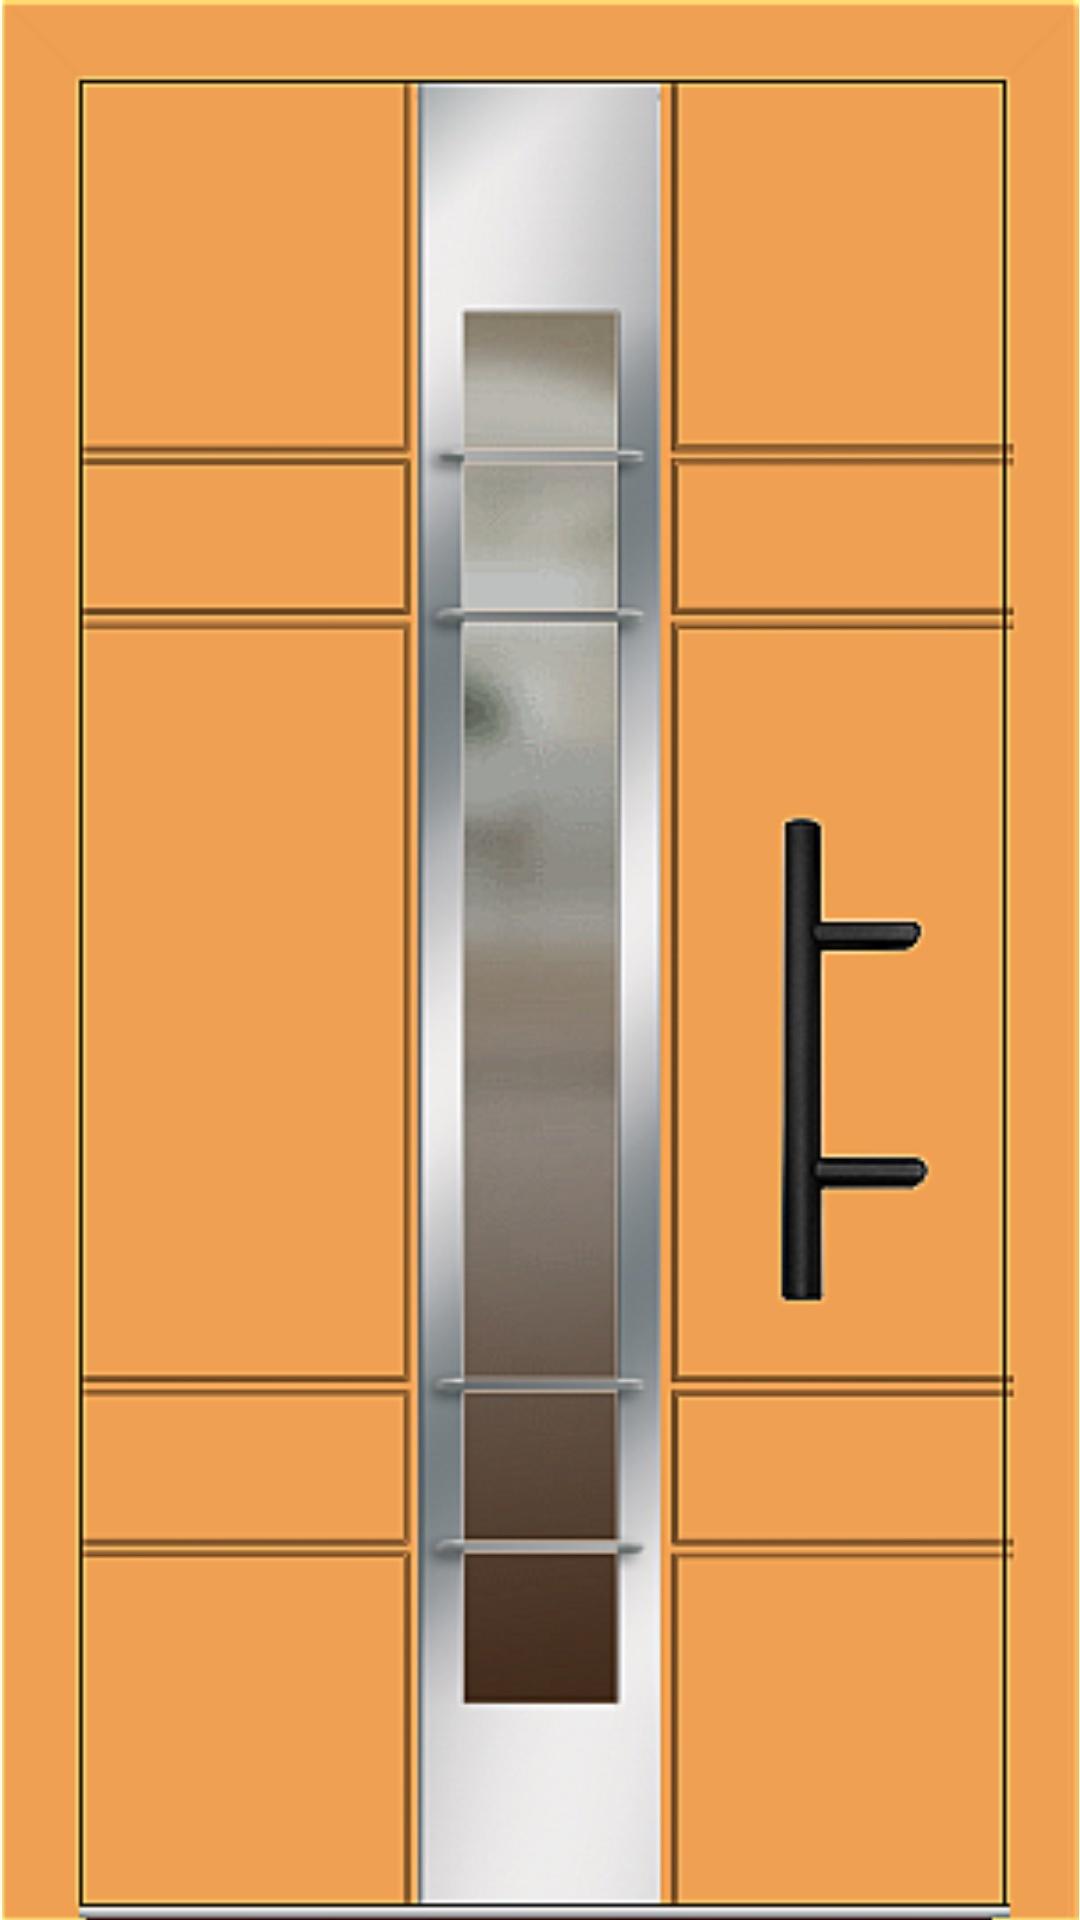 Holz-Alu Haustür Modell 62700 safrangelb